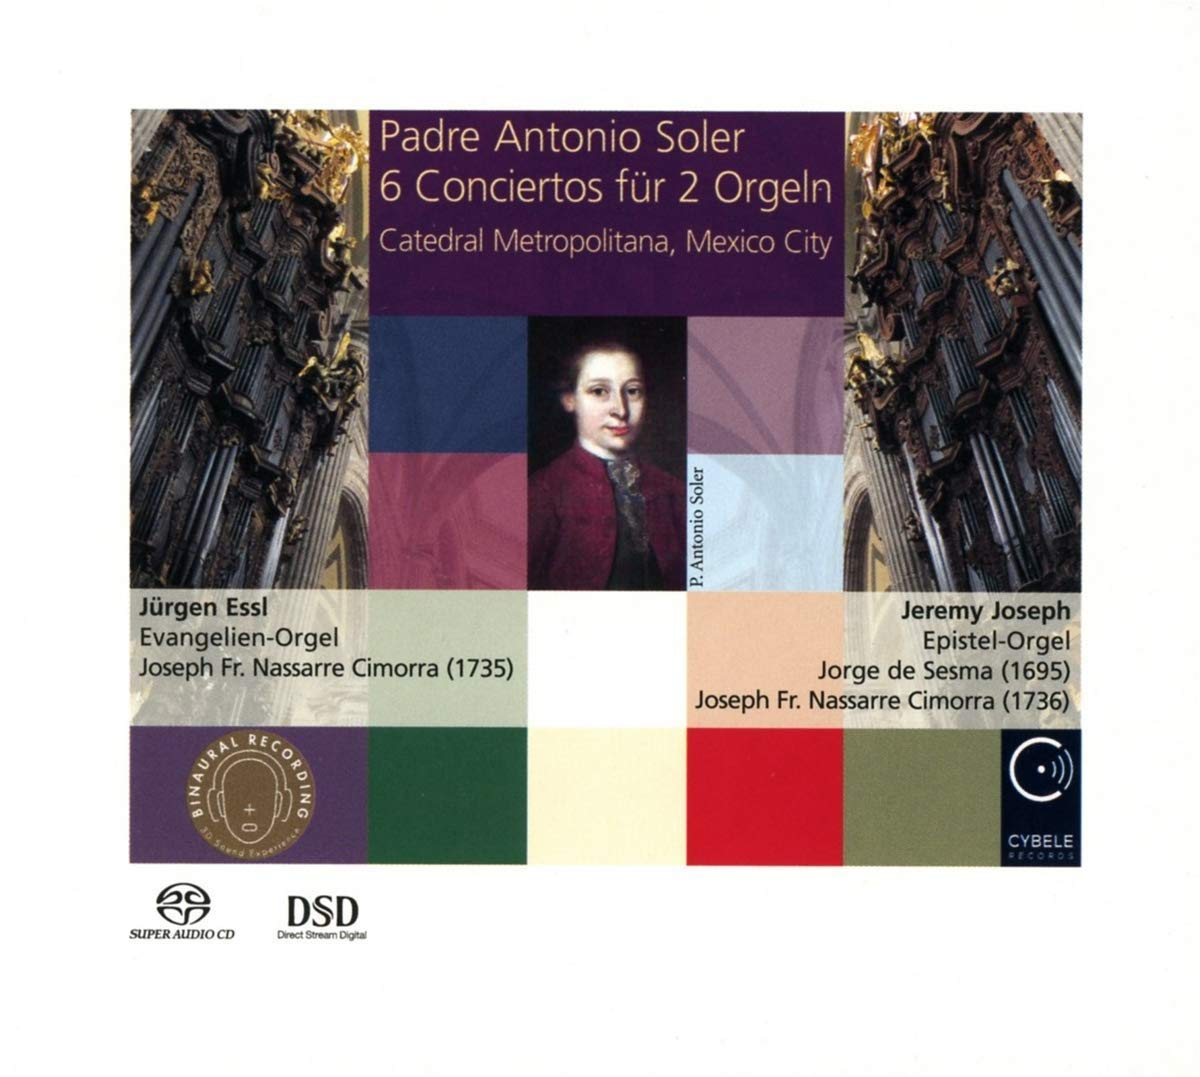 SACD : JUERGEN ESSL - JEREMY JOSEPH - 6 Conciertos For 2 Organs (Hybrid SACD)